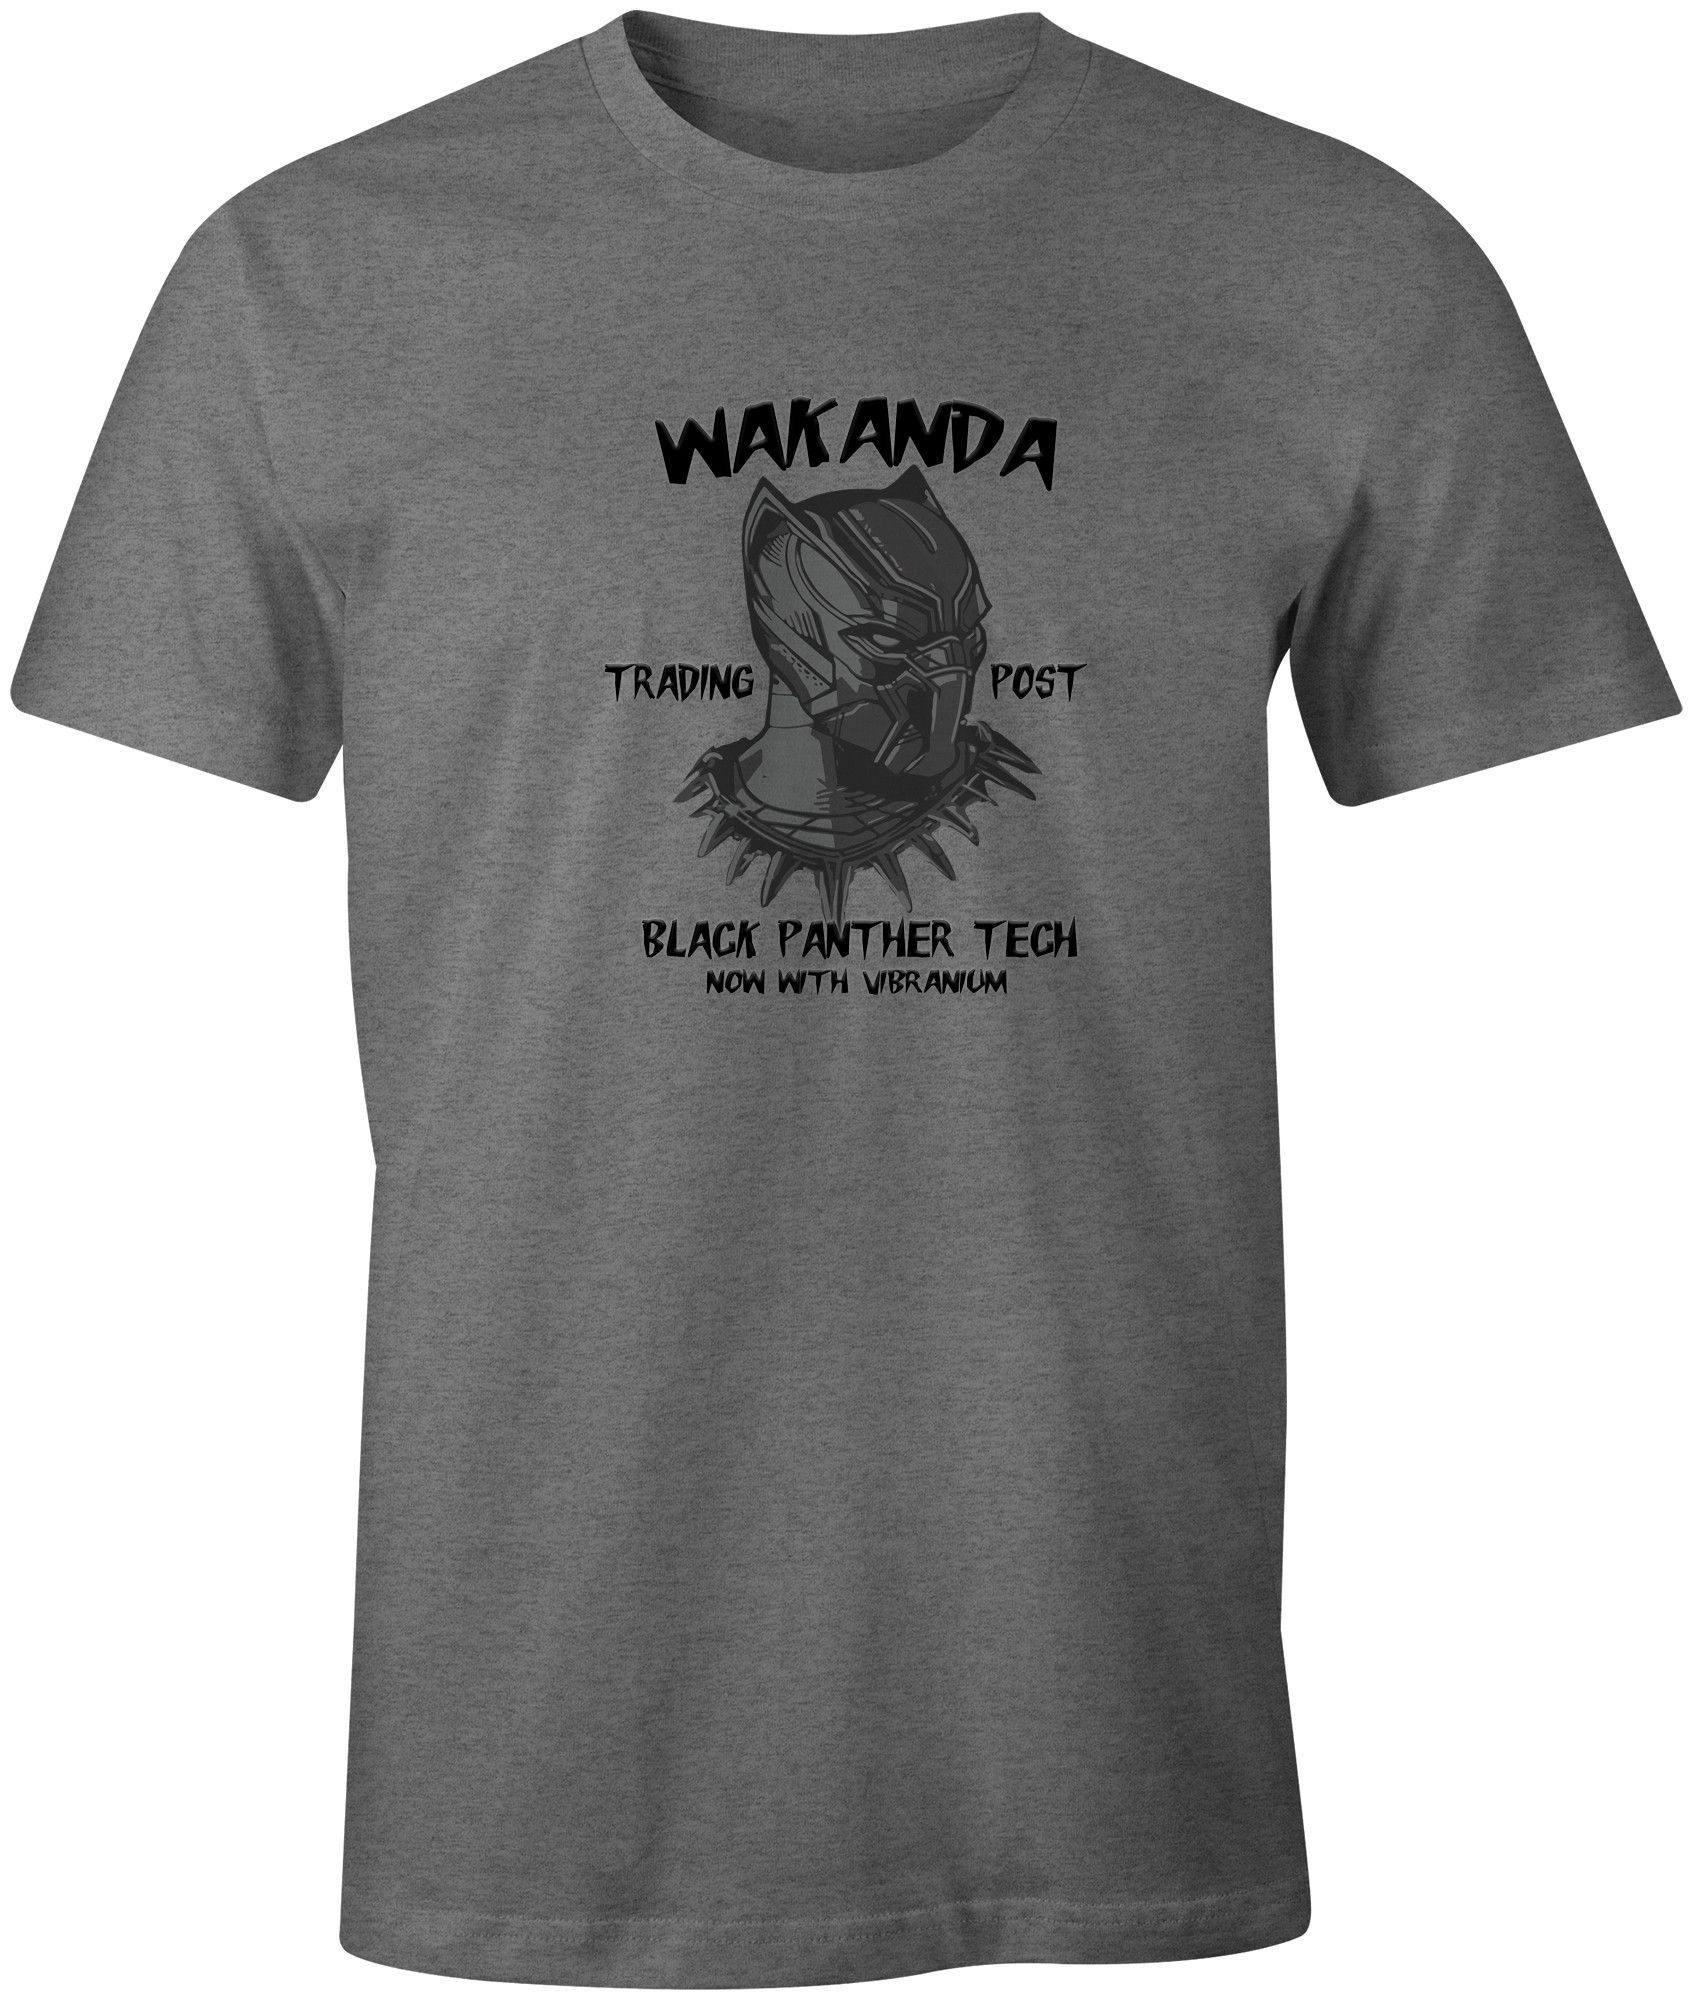 Marvel negro pantera T Shirt Wakanda África (4) para hombre, para niños, color negro, gris, gris, hombreL